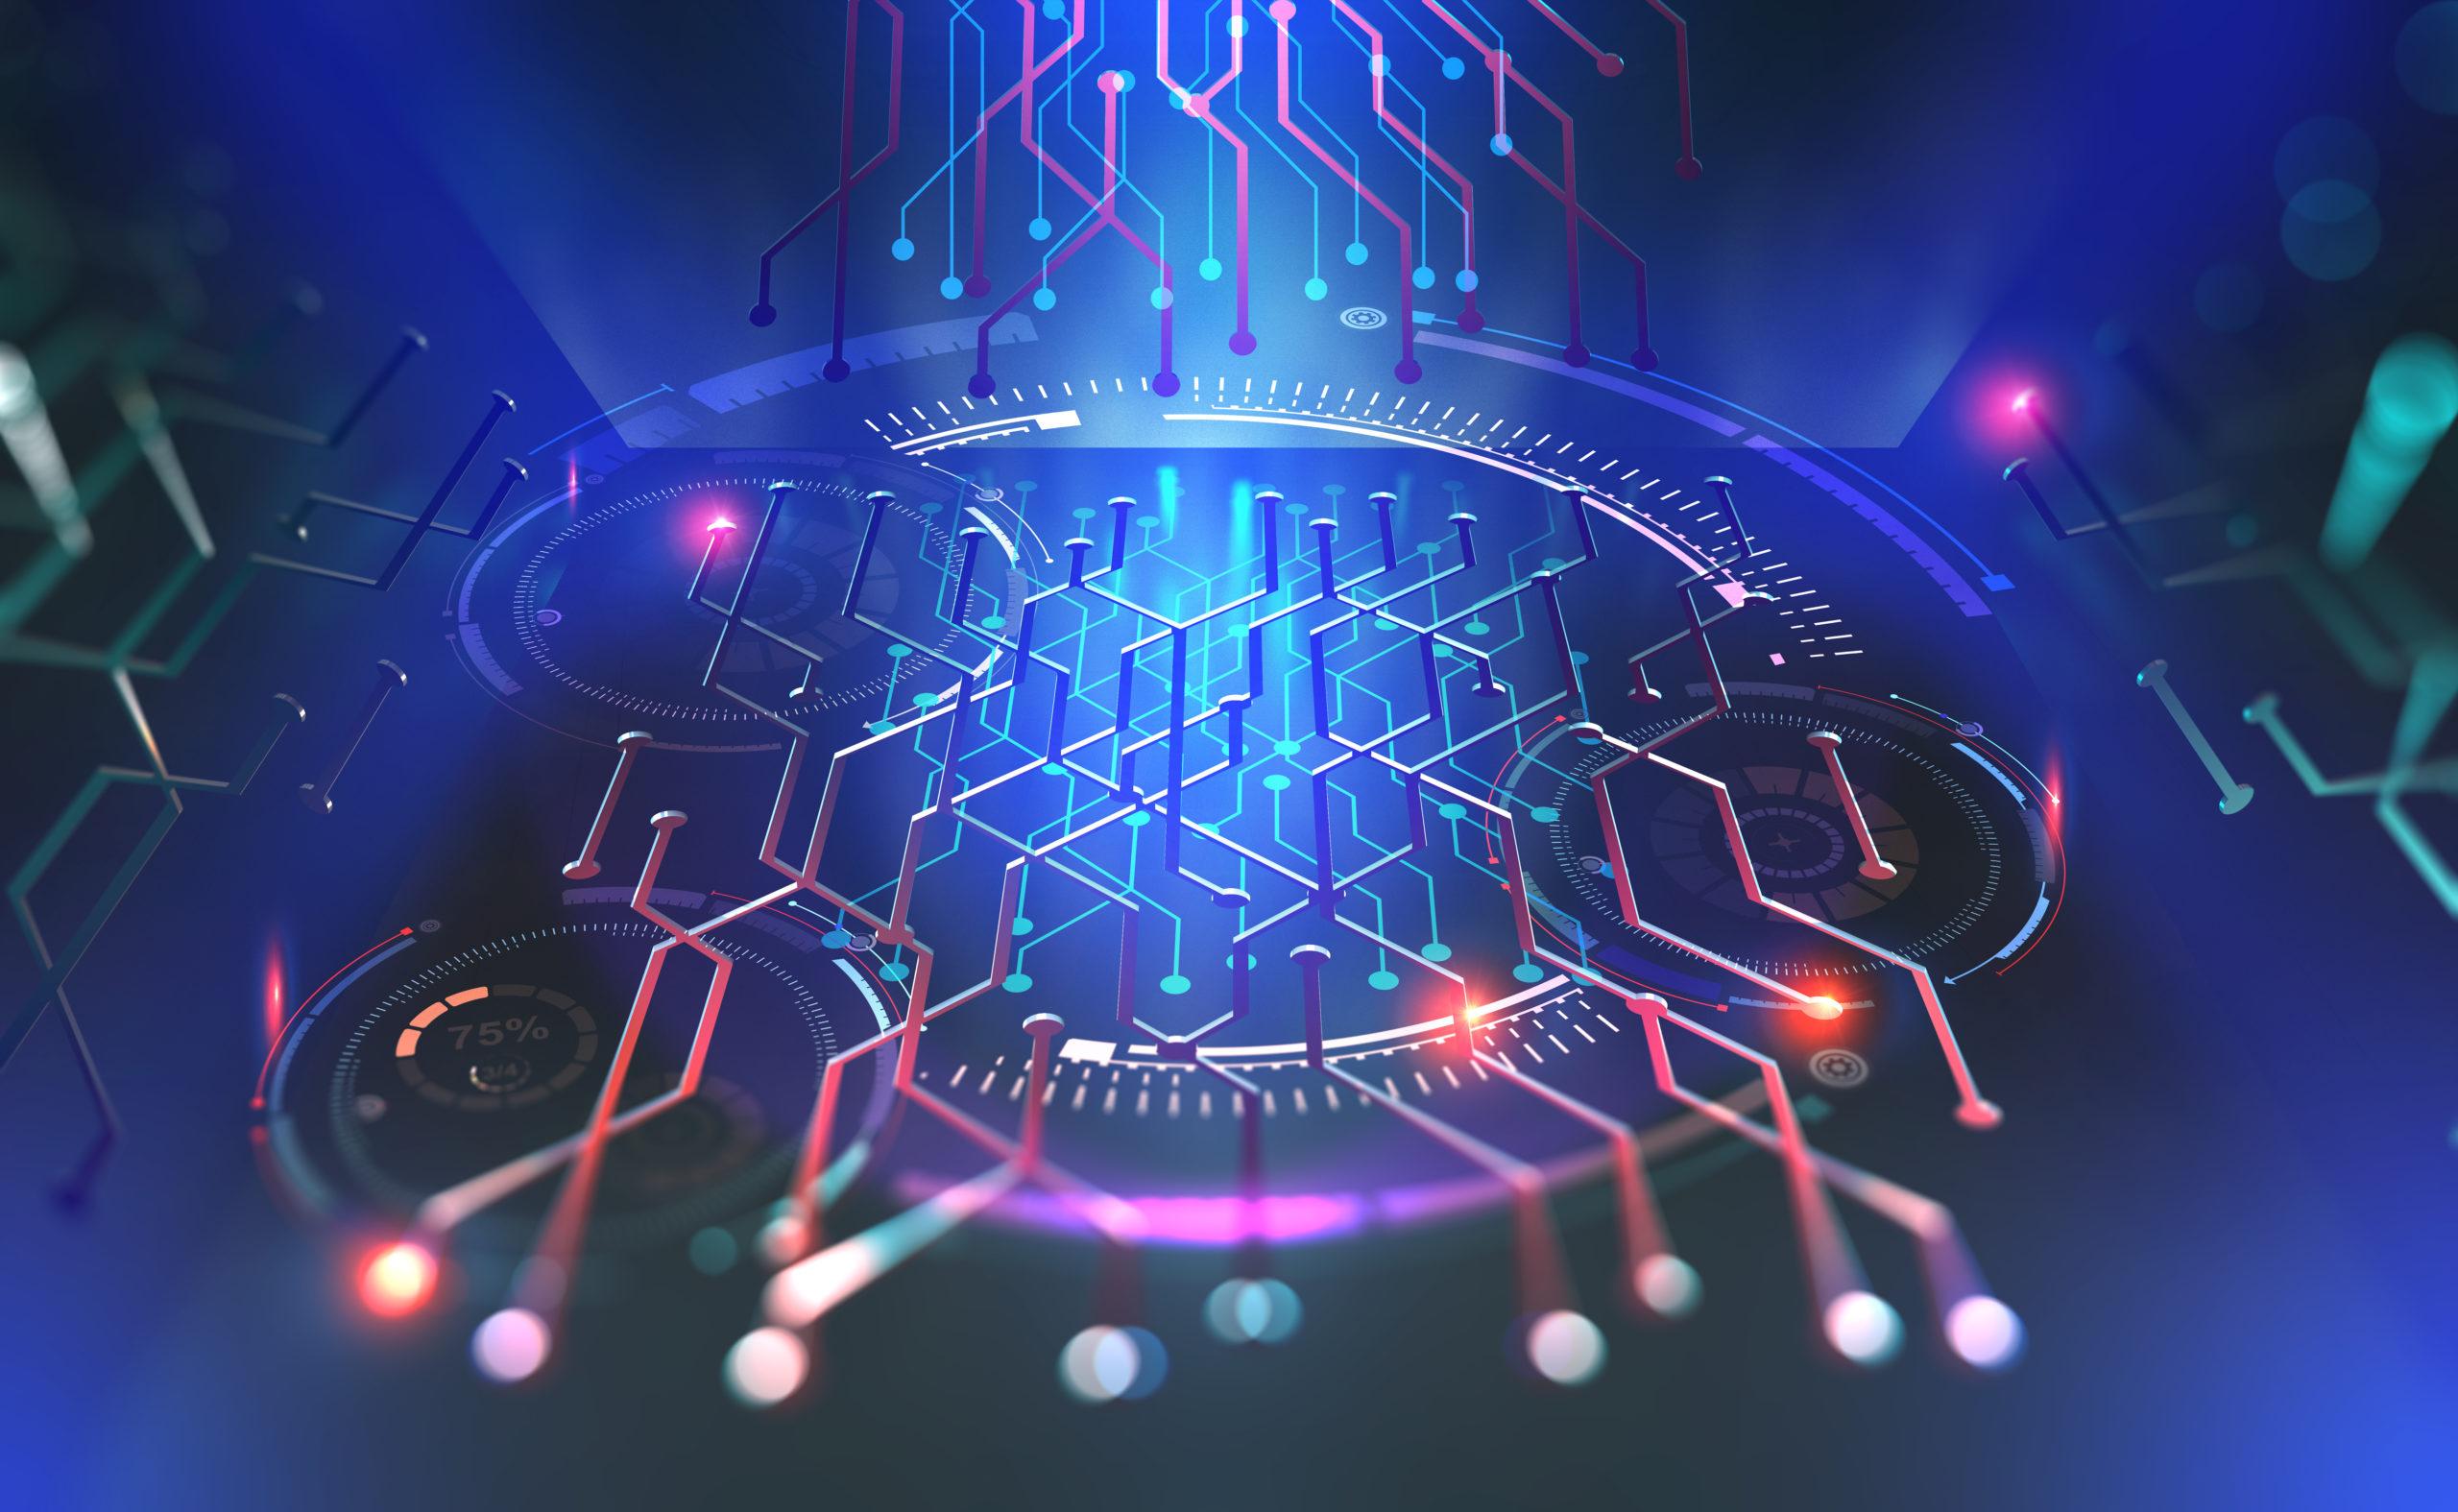 Inverse designed ultra-flat optics via artificial intelligence